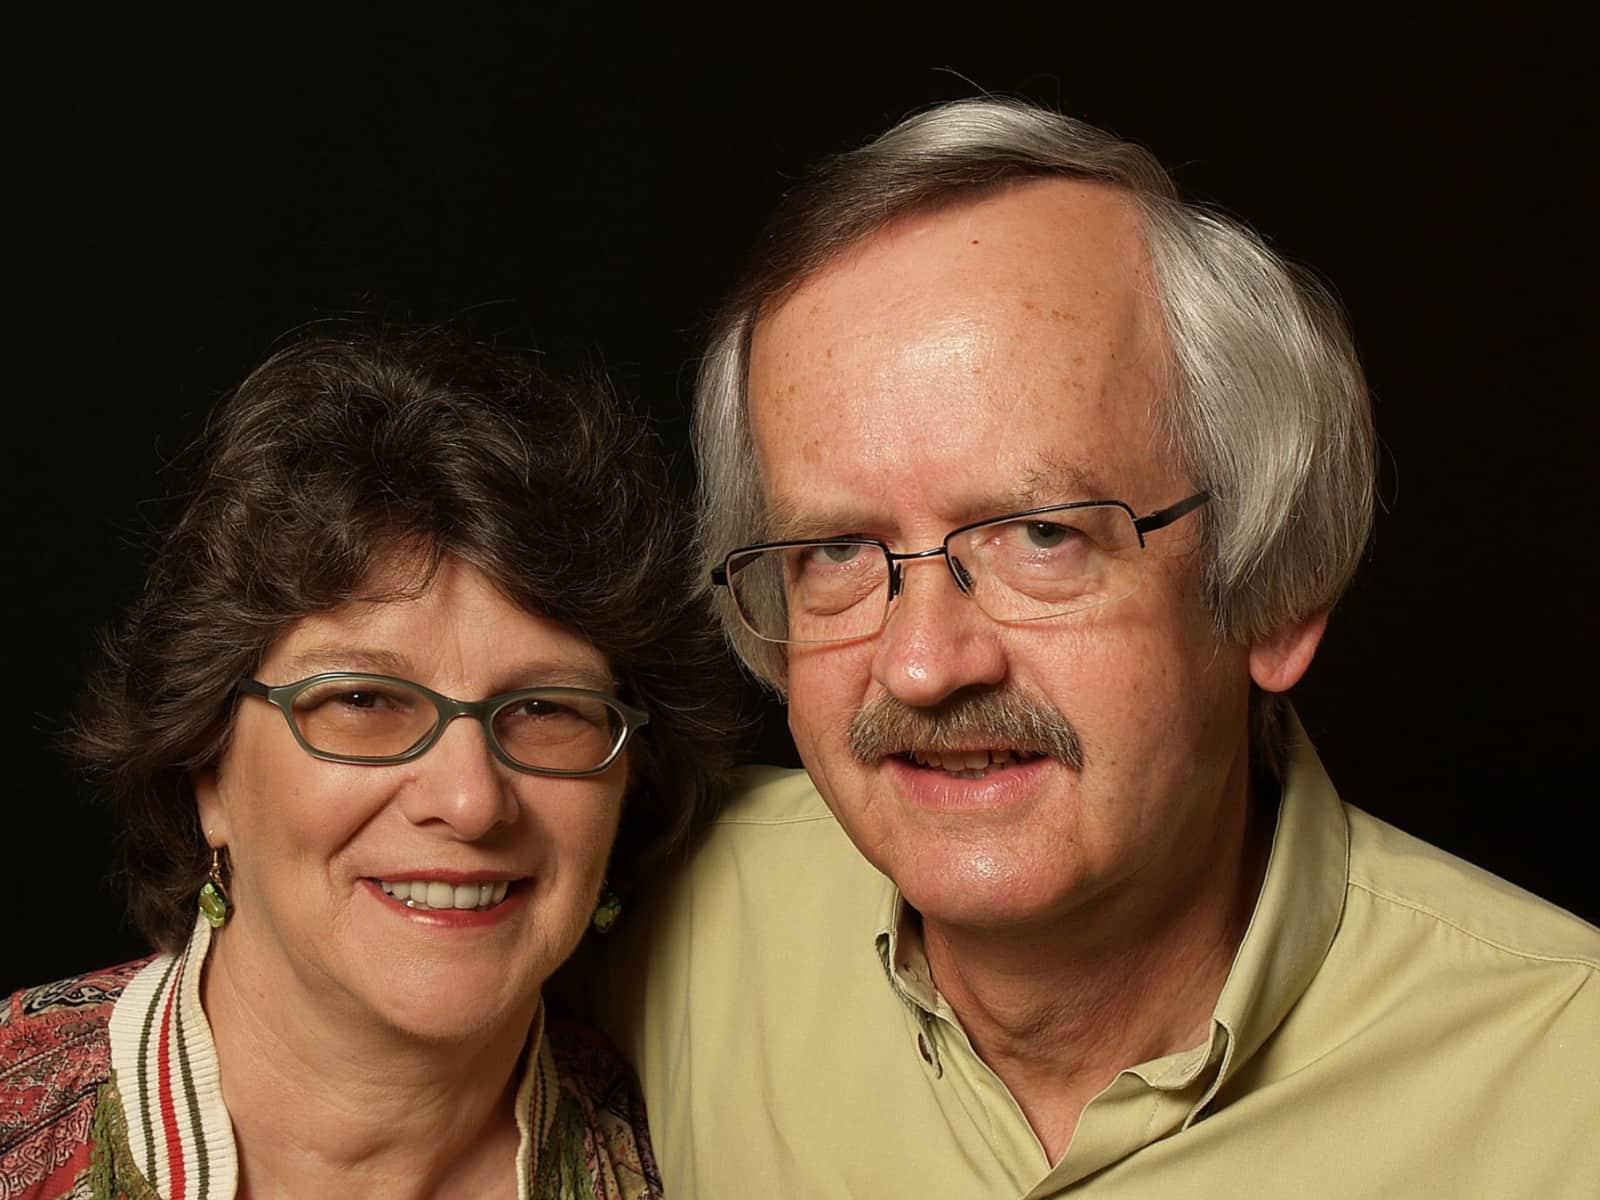 Bret & Maria from Glen Forrest, Western Australia, Australia